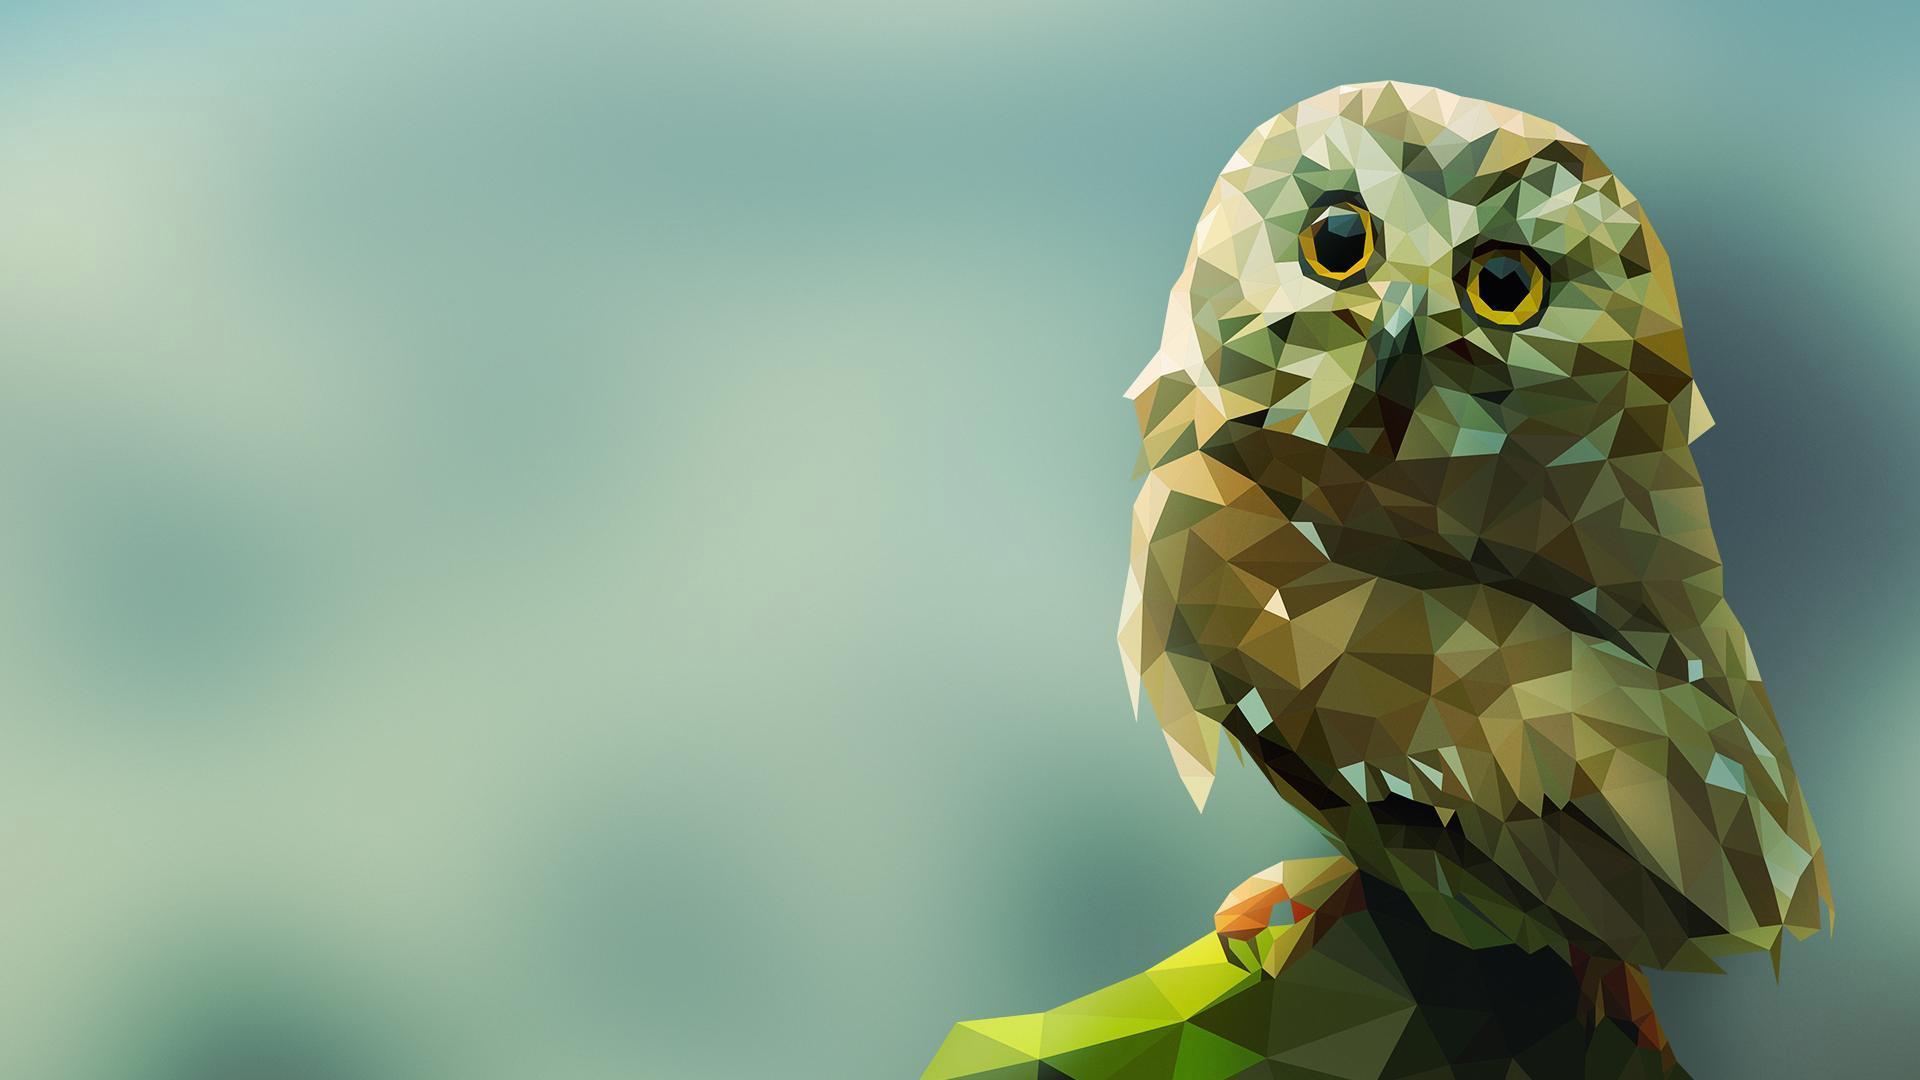 3d-Owl-1920x1080-wallpaper-wpc5801431